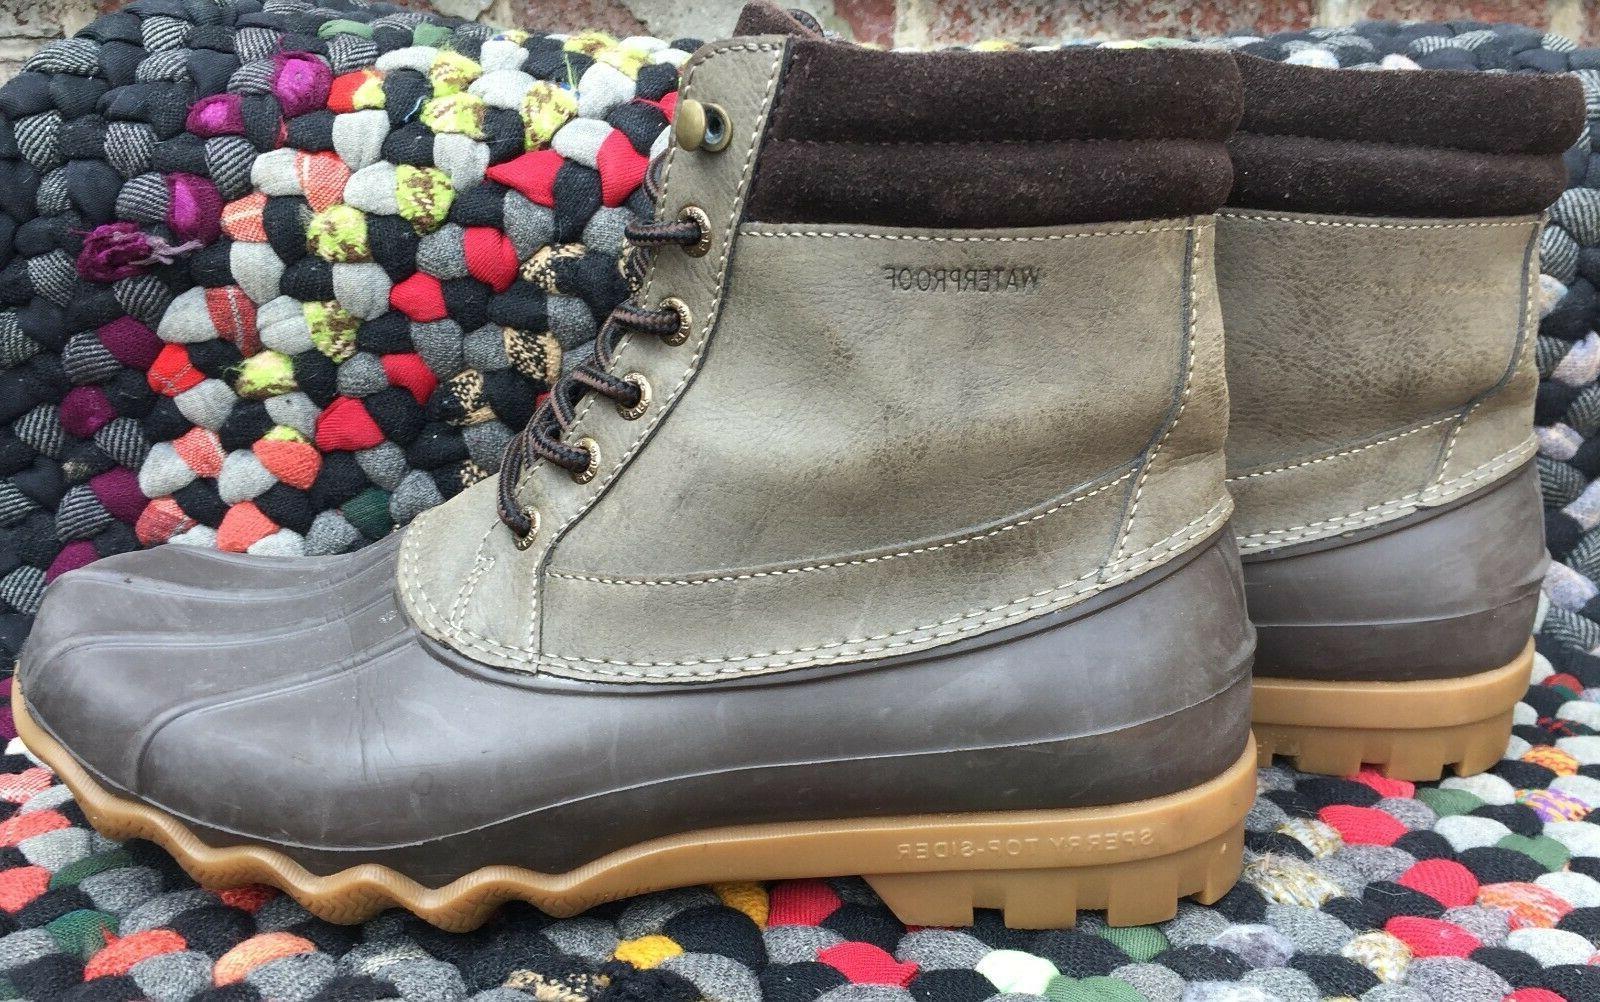 Men's Brewster Rain Duck Boot Waterproof Brown Leather 8